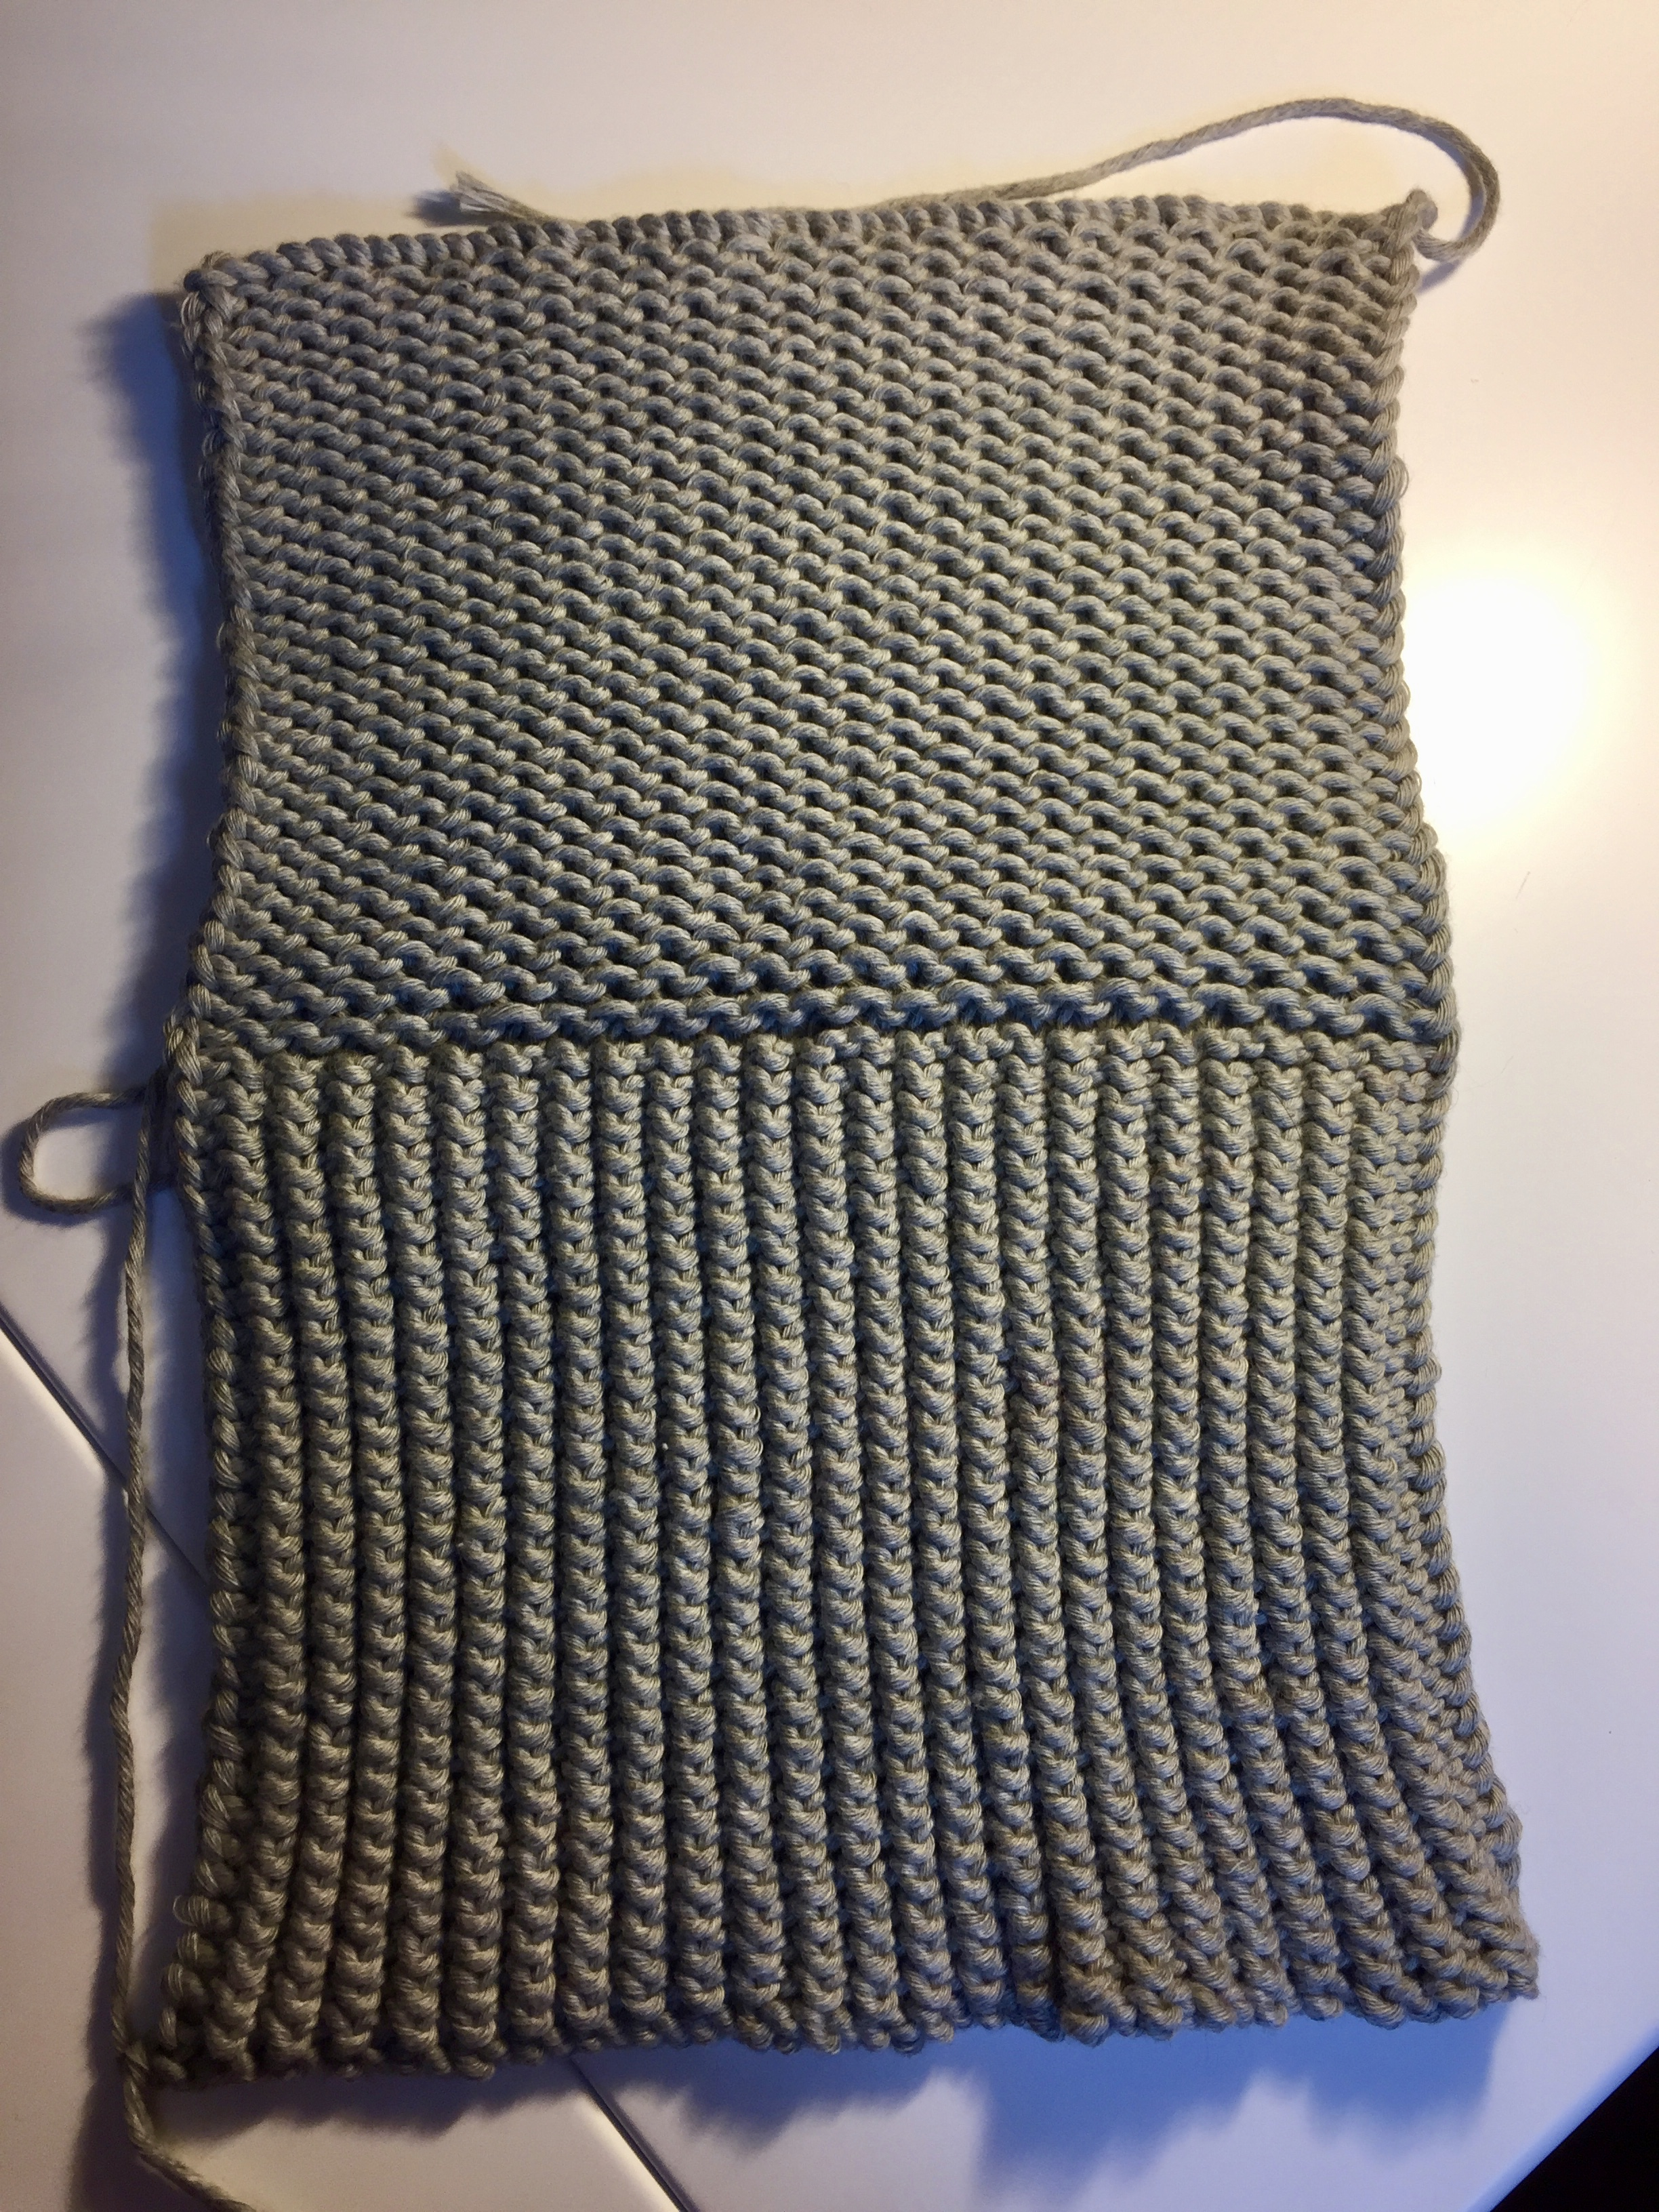 Knit cotton shower mitt